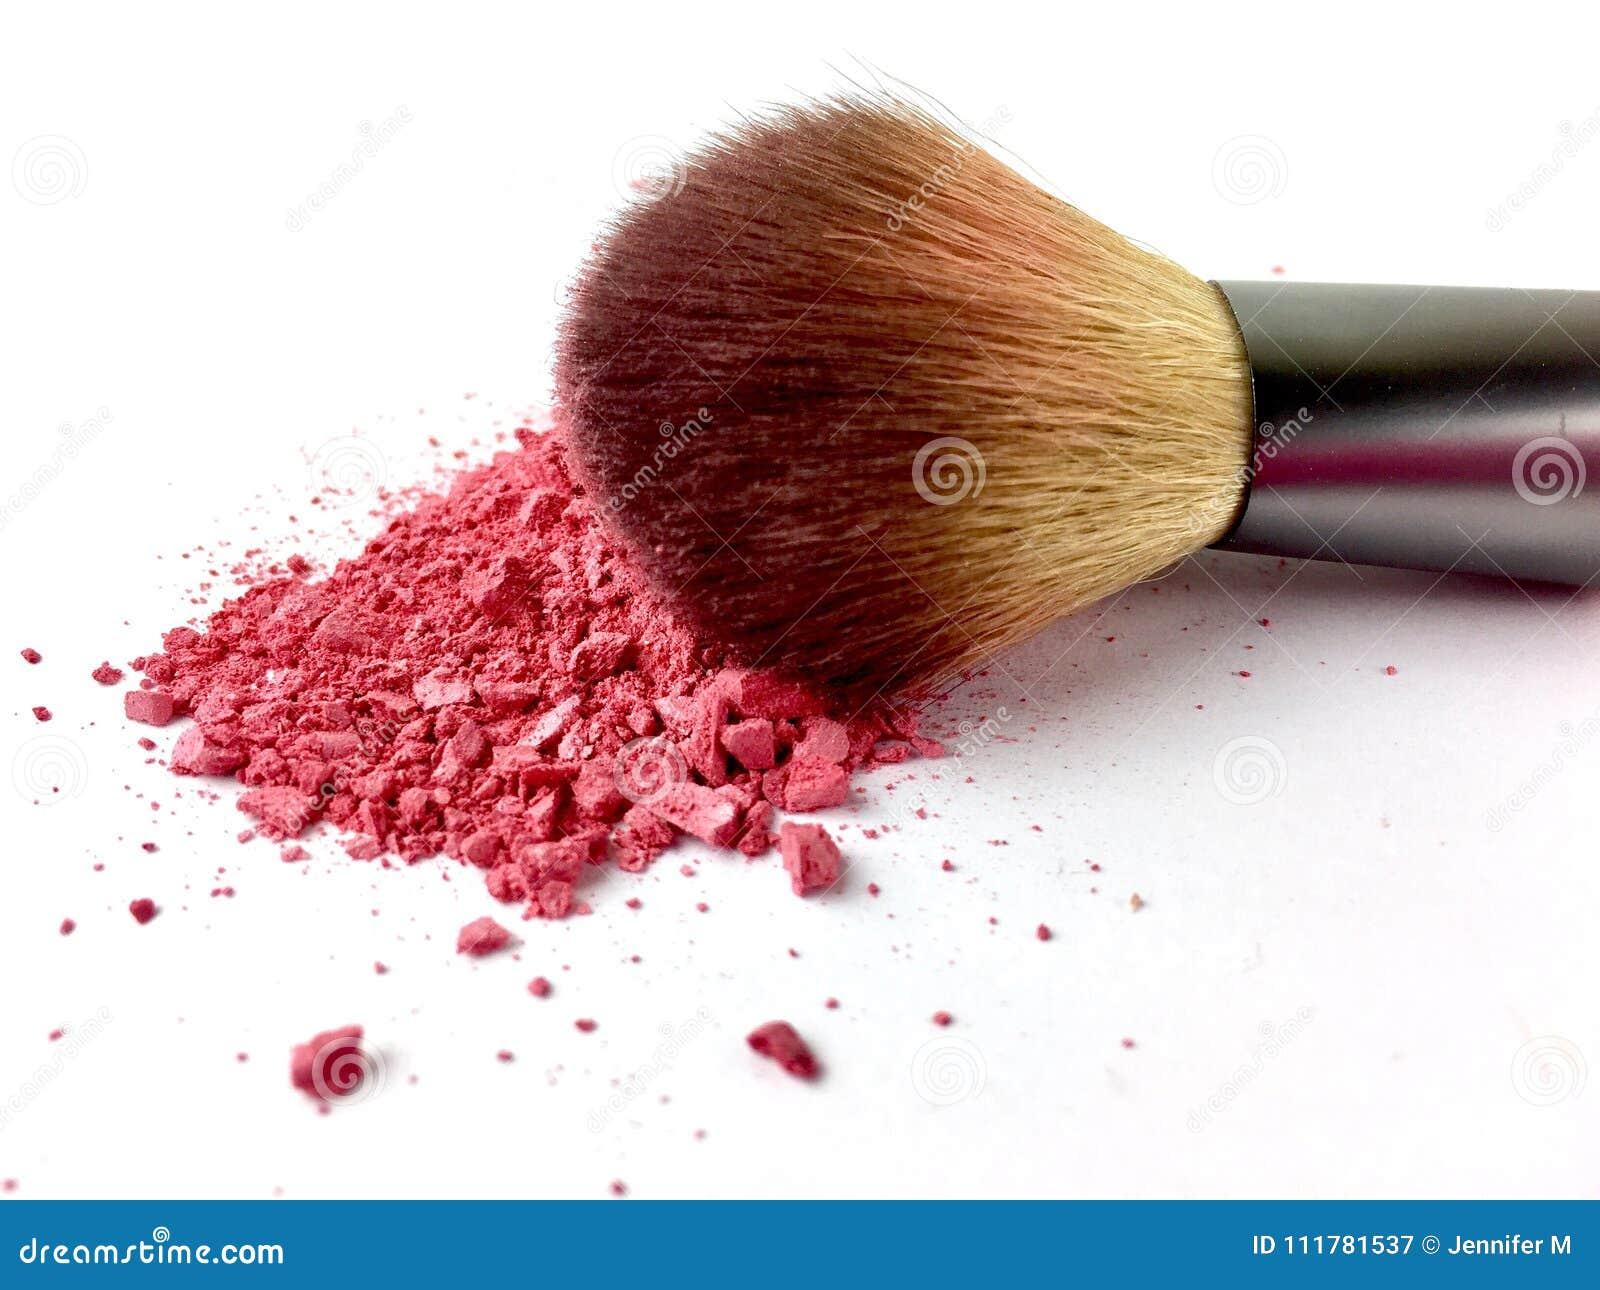 Pink powder and blush brush on a white background